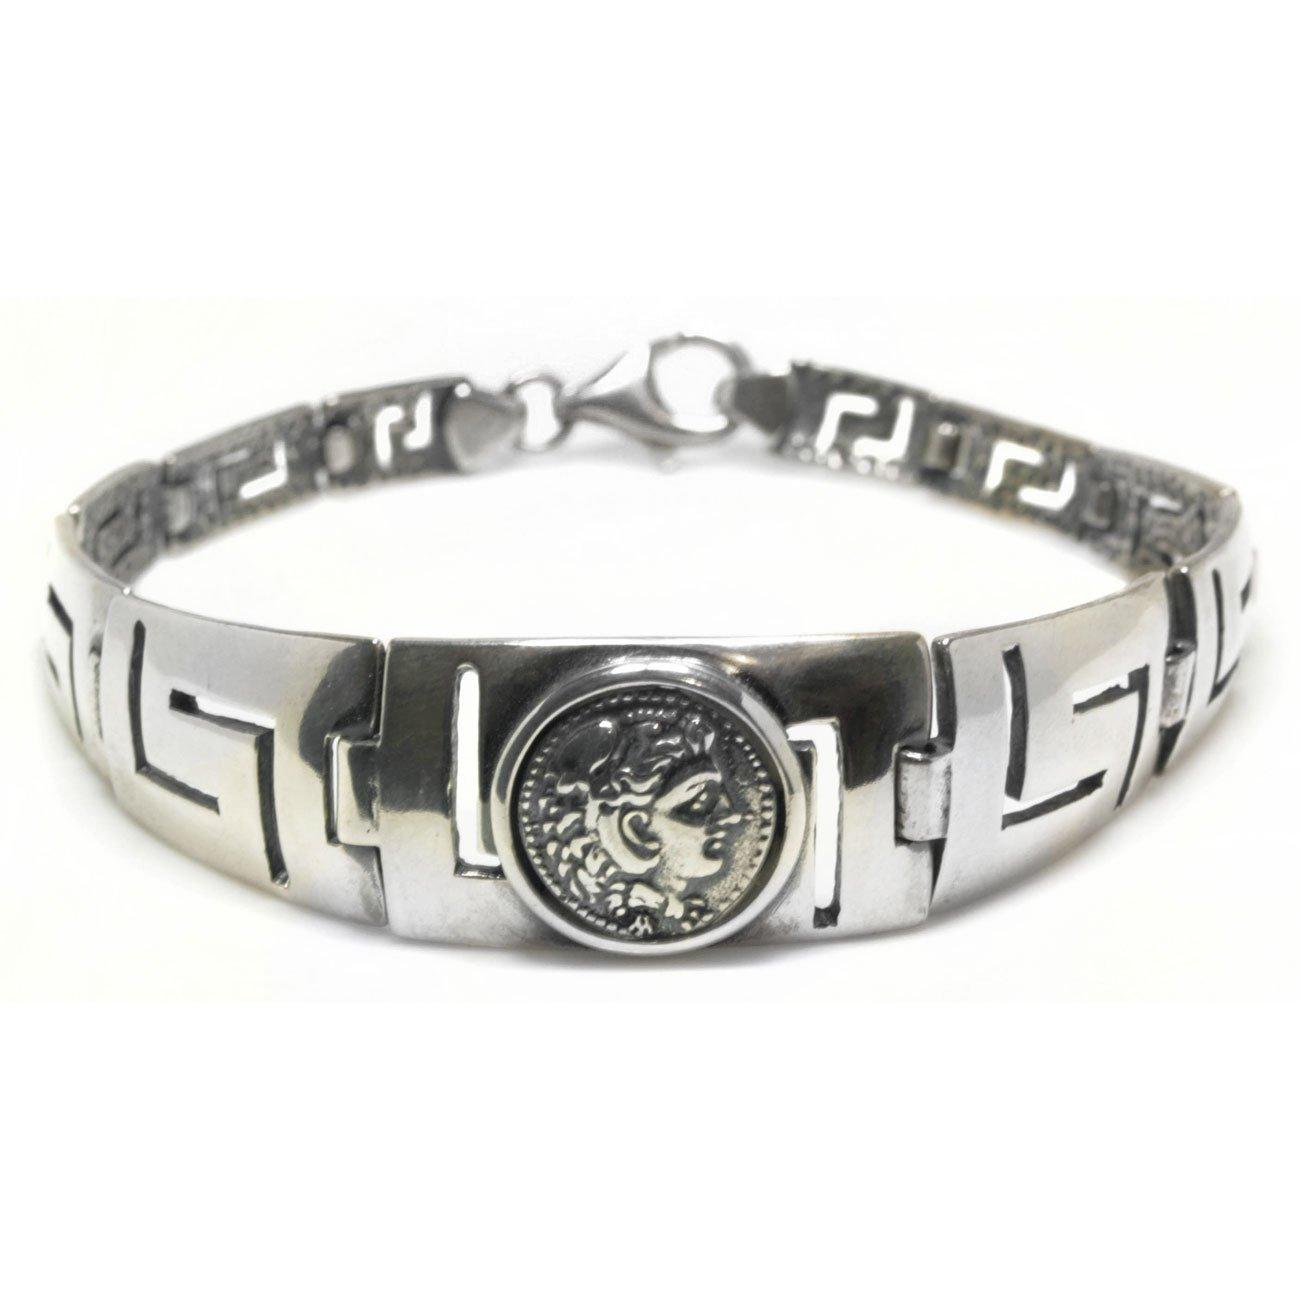 Hercules - Ancient Greek Erythrai Drachma Coin & Meander-Sterling Silver Bracelet